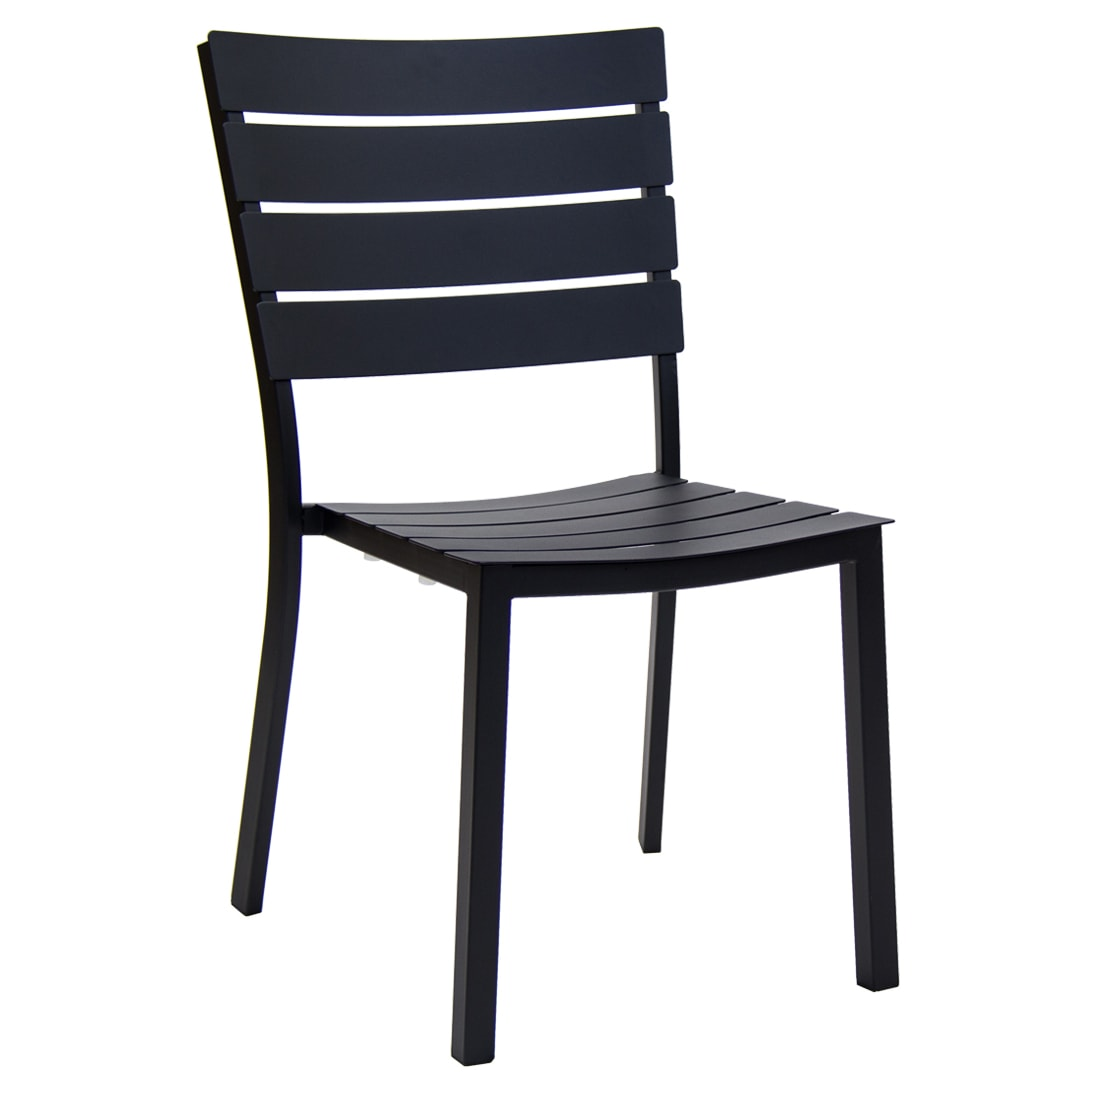 Slatted Metal Patio Chair